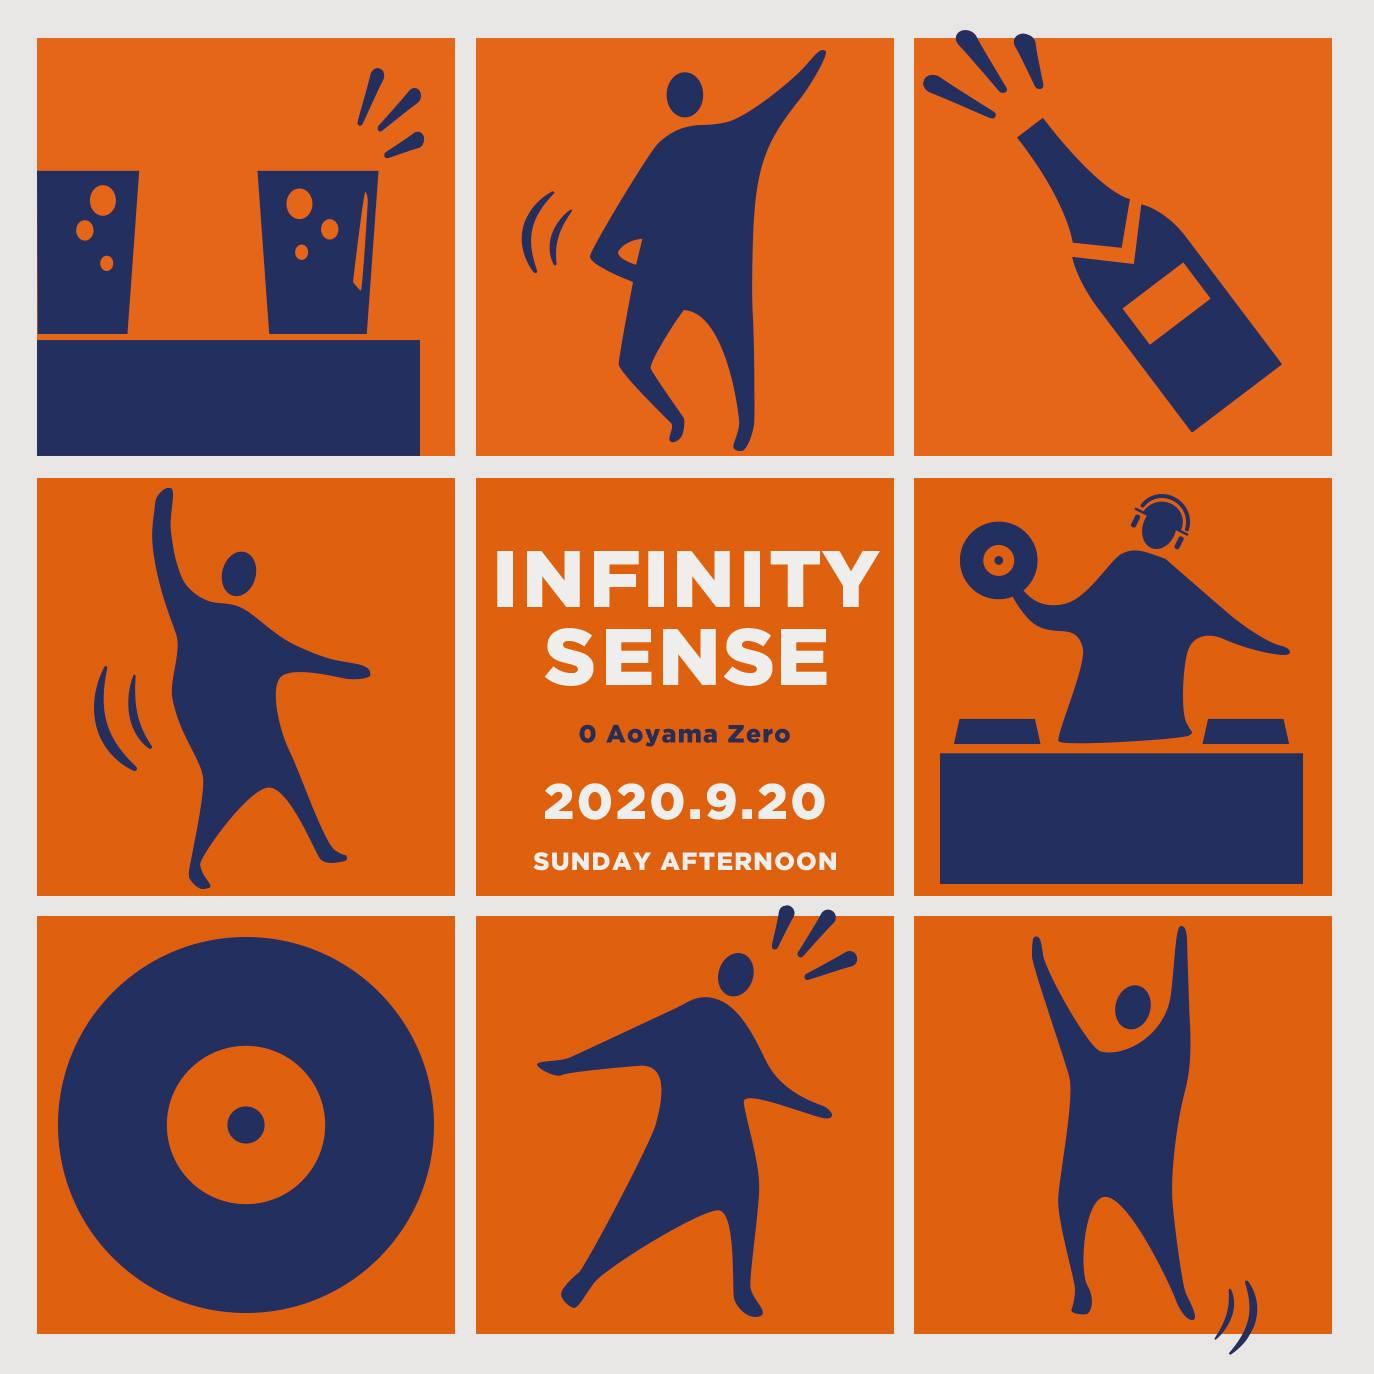 InfinitySense